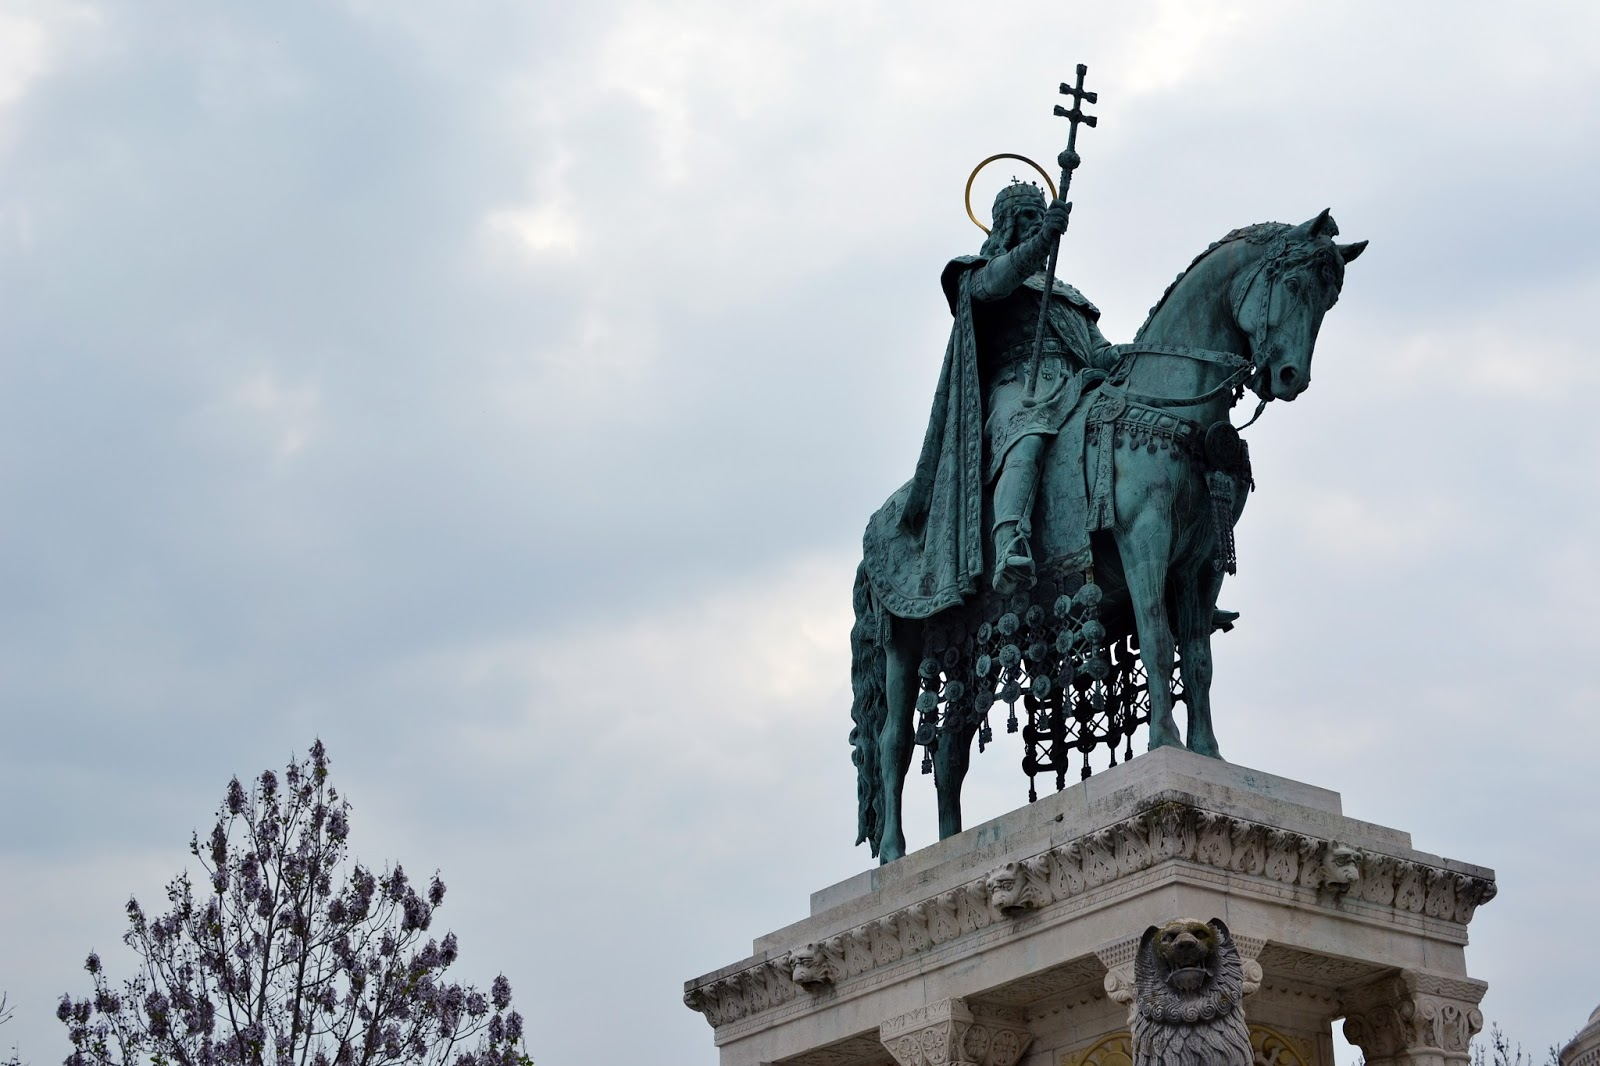 Budapest, photography, night time, architecture, travel, blog, adventure, exploration, st Stephen, Szent Istvan